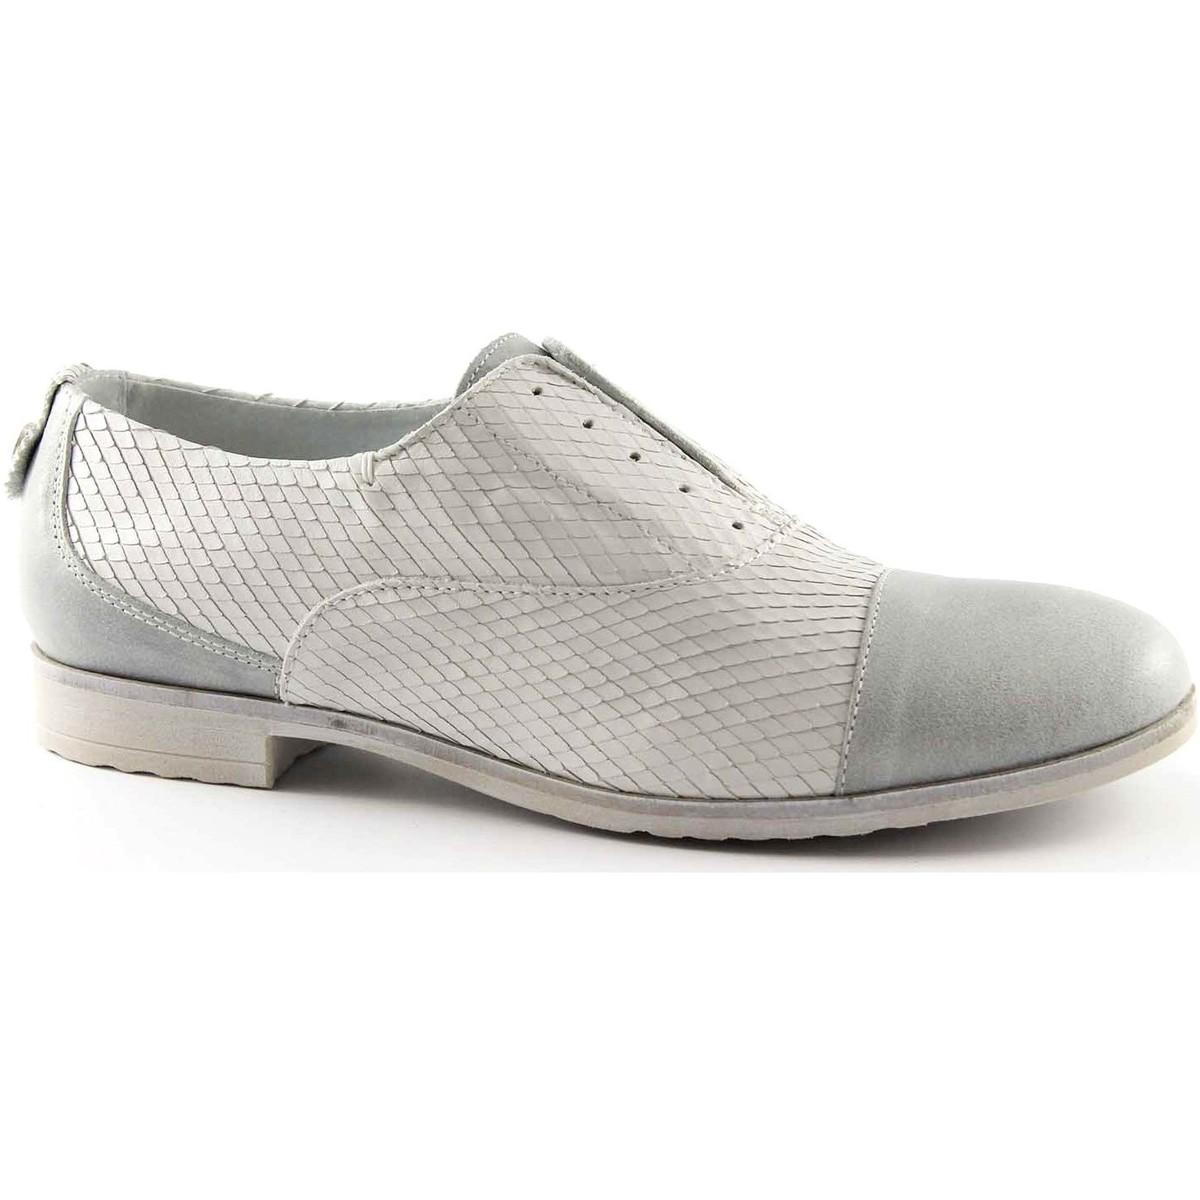 Café Noir CAF NOIR EB630 weiße Schuhe Ice Spitze Brogues ohne Schnürsenkel Bianco - Schuhe Richelieu Damen 103,20 €